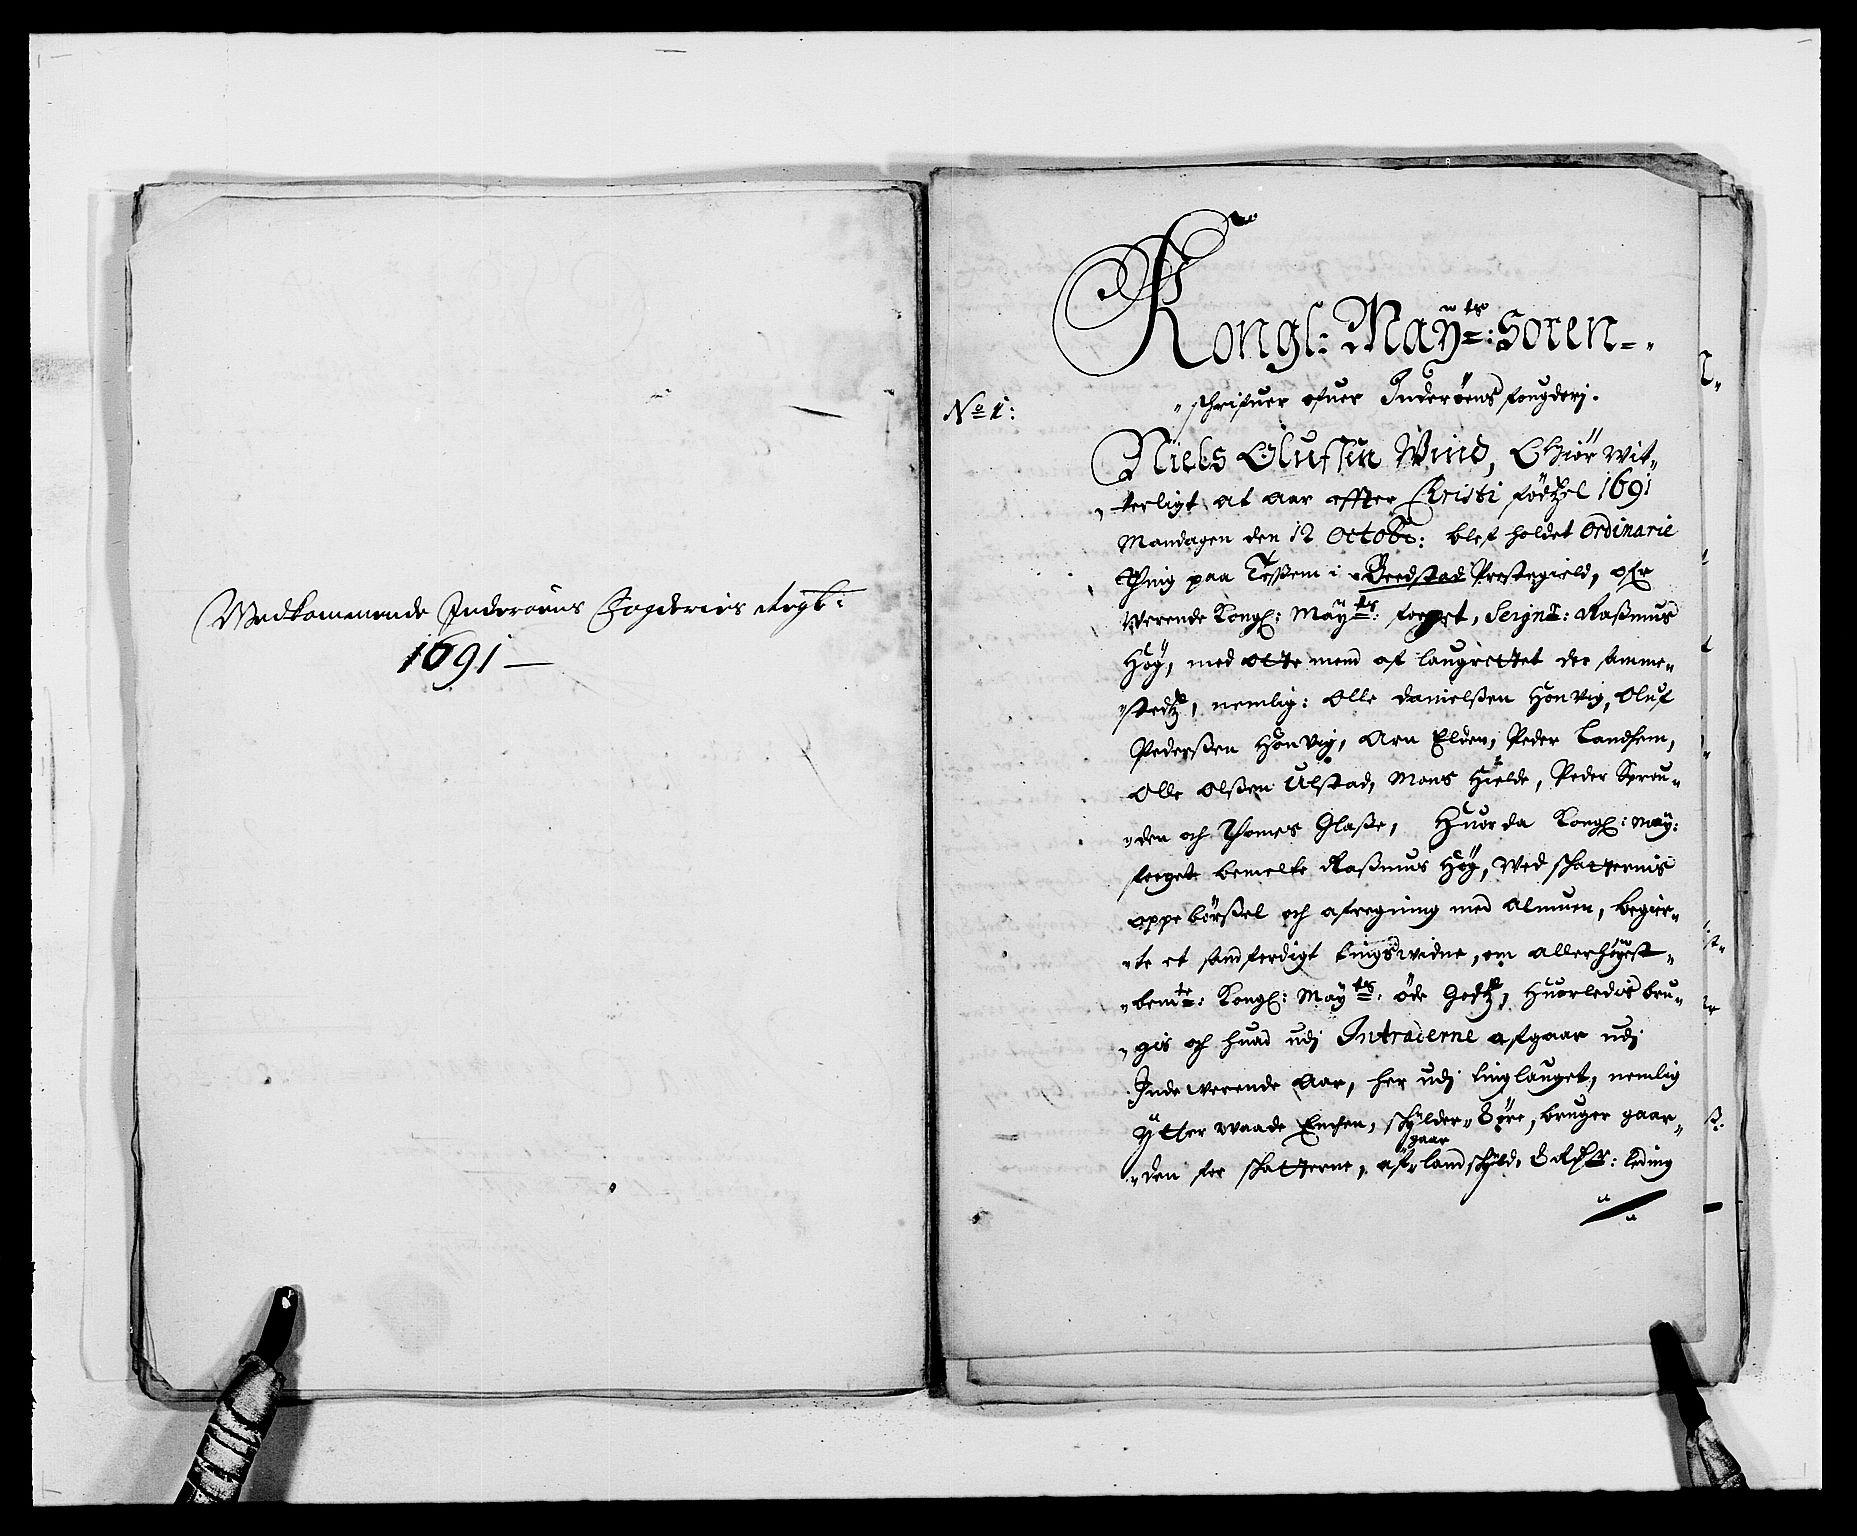 RA, Rentekammeret inntil 1814, Reviderte regnskaper, Fogderegnskap, R63/L4307: Fogderegnskap Inderøy, 1690-1691, s. 438